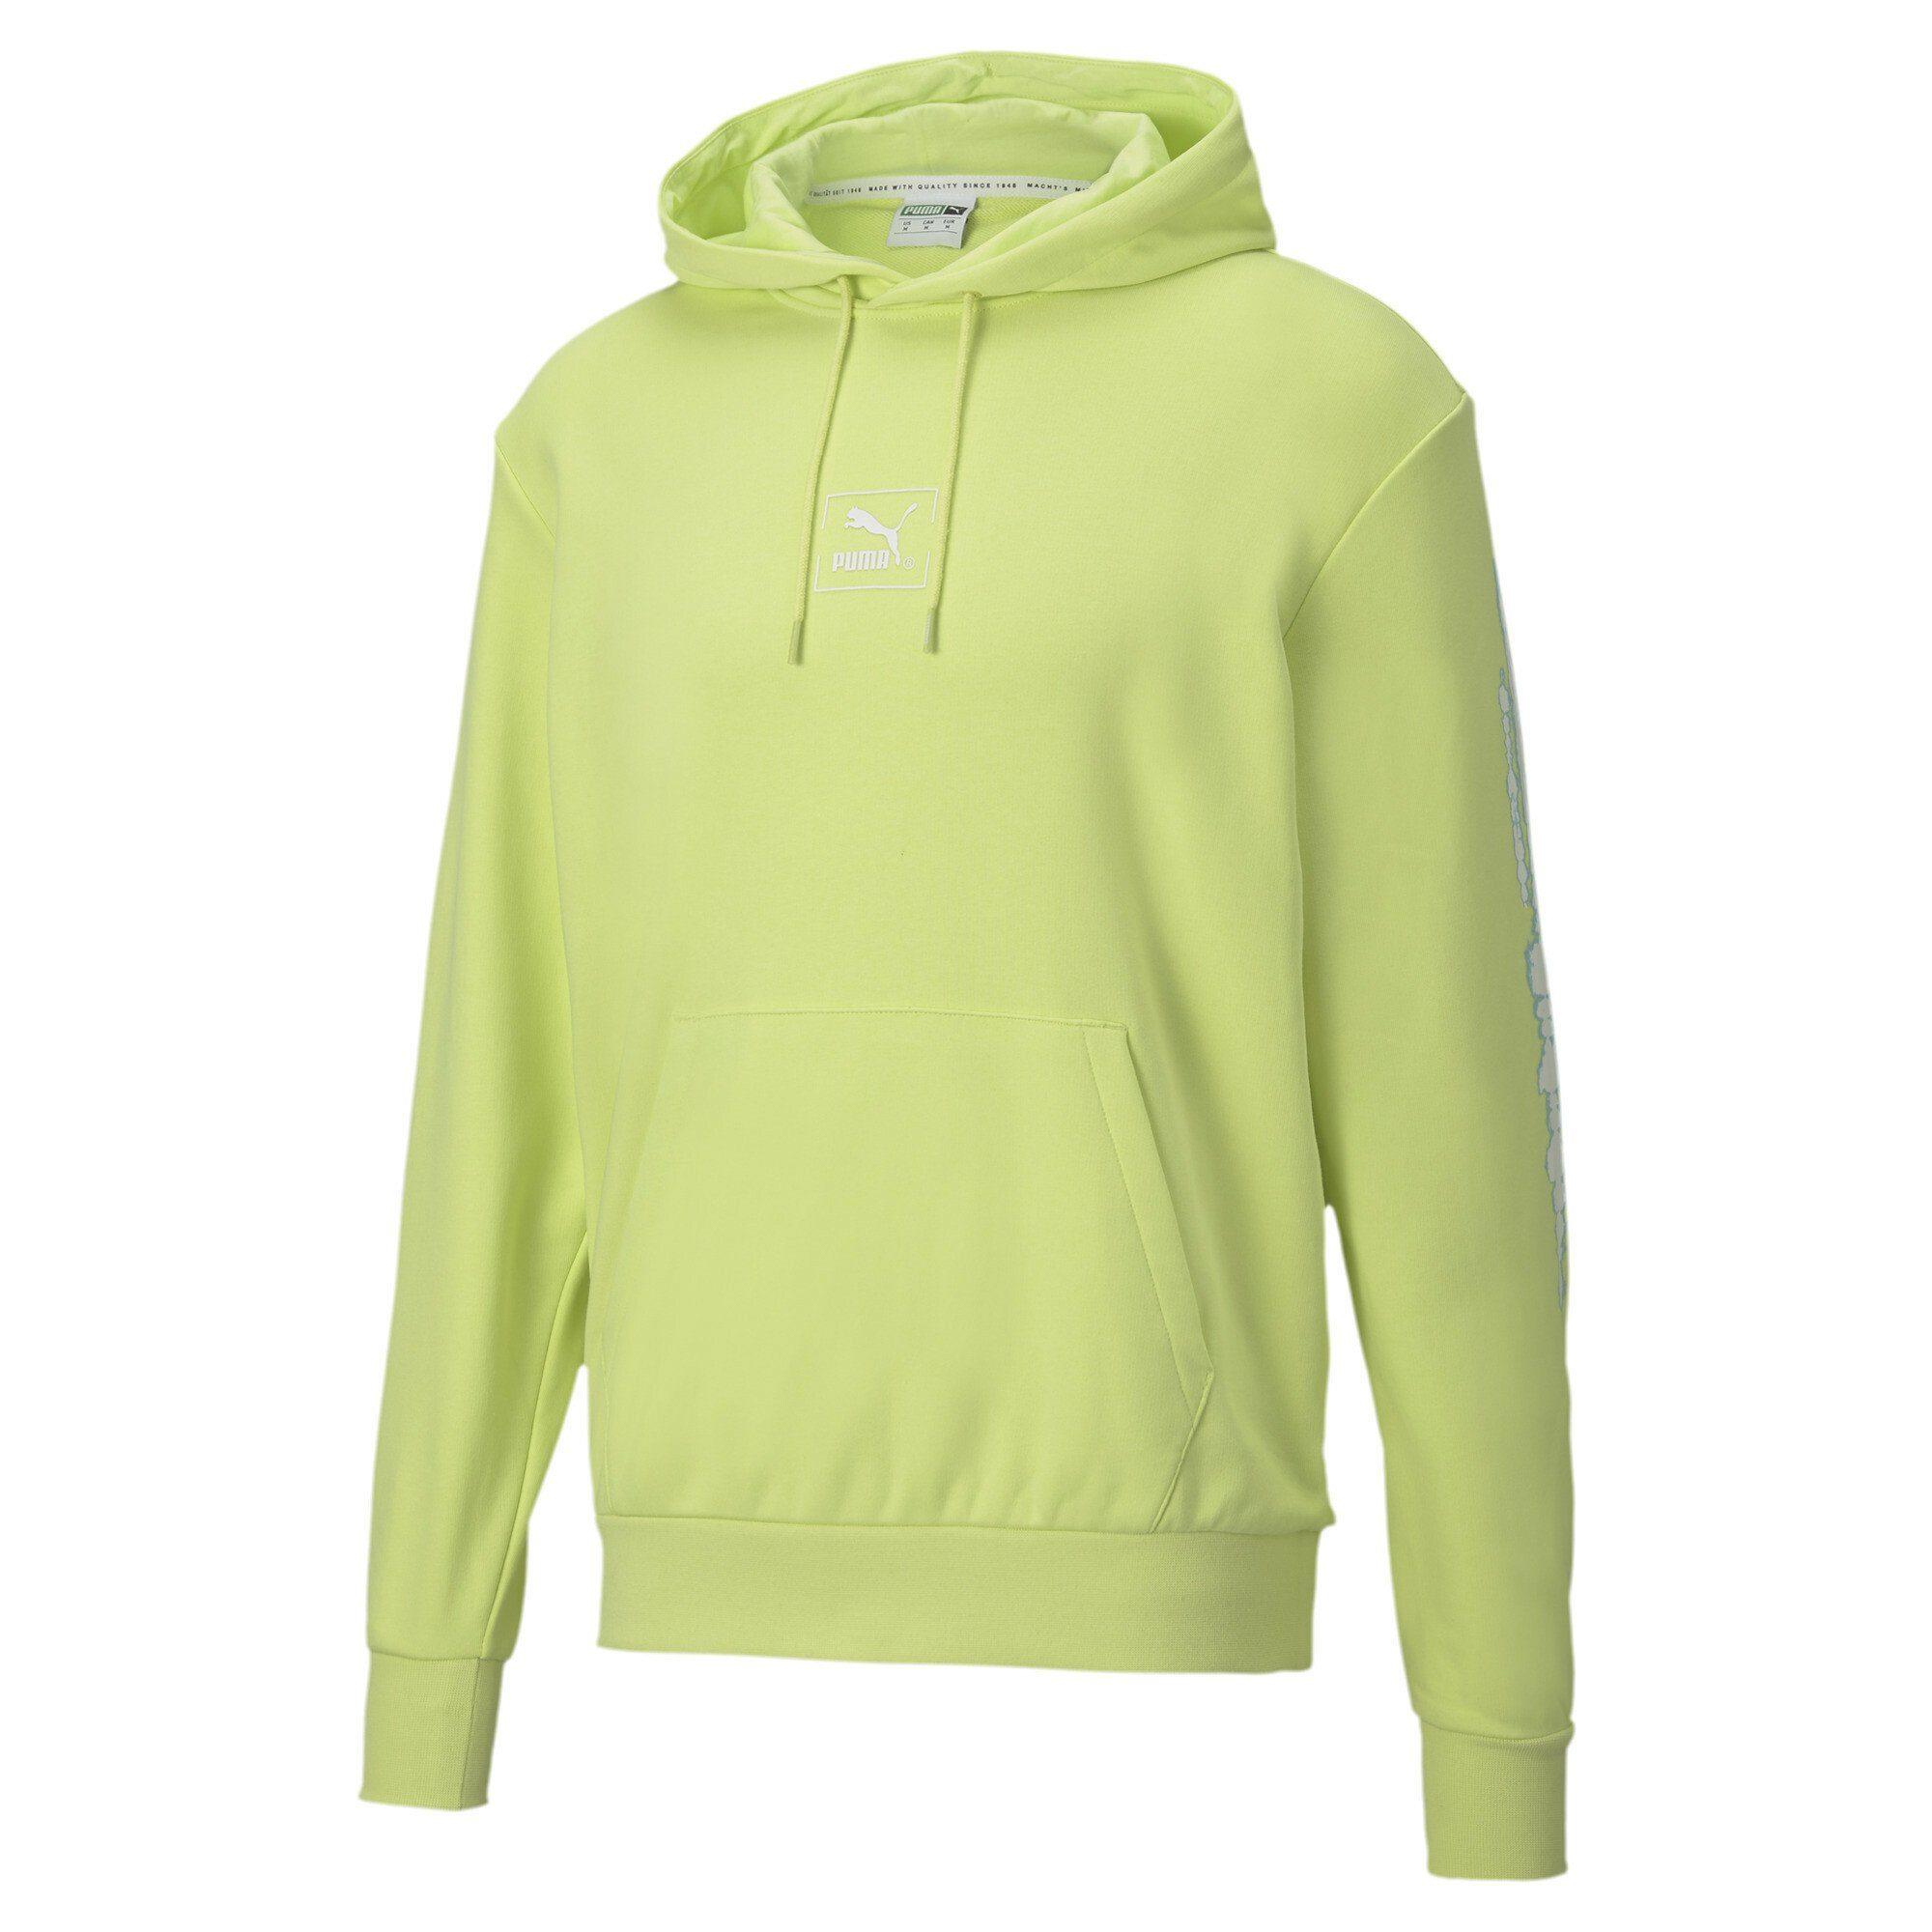 PUMA Herren Pullover Tech Graphic Hooded: : Bekleidung